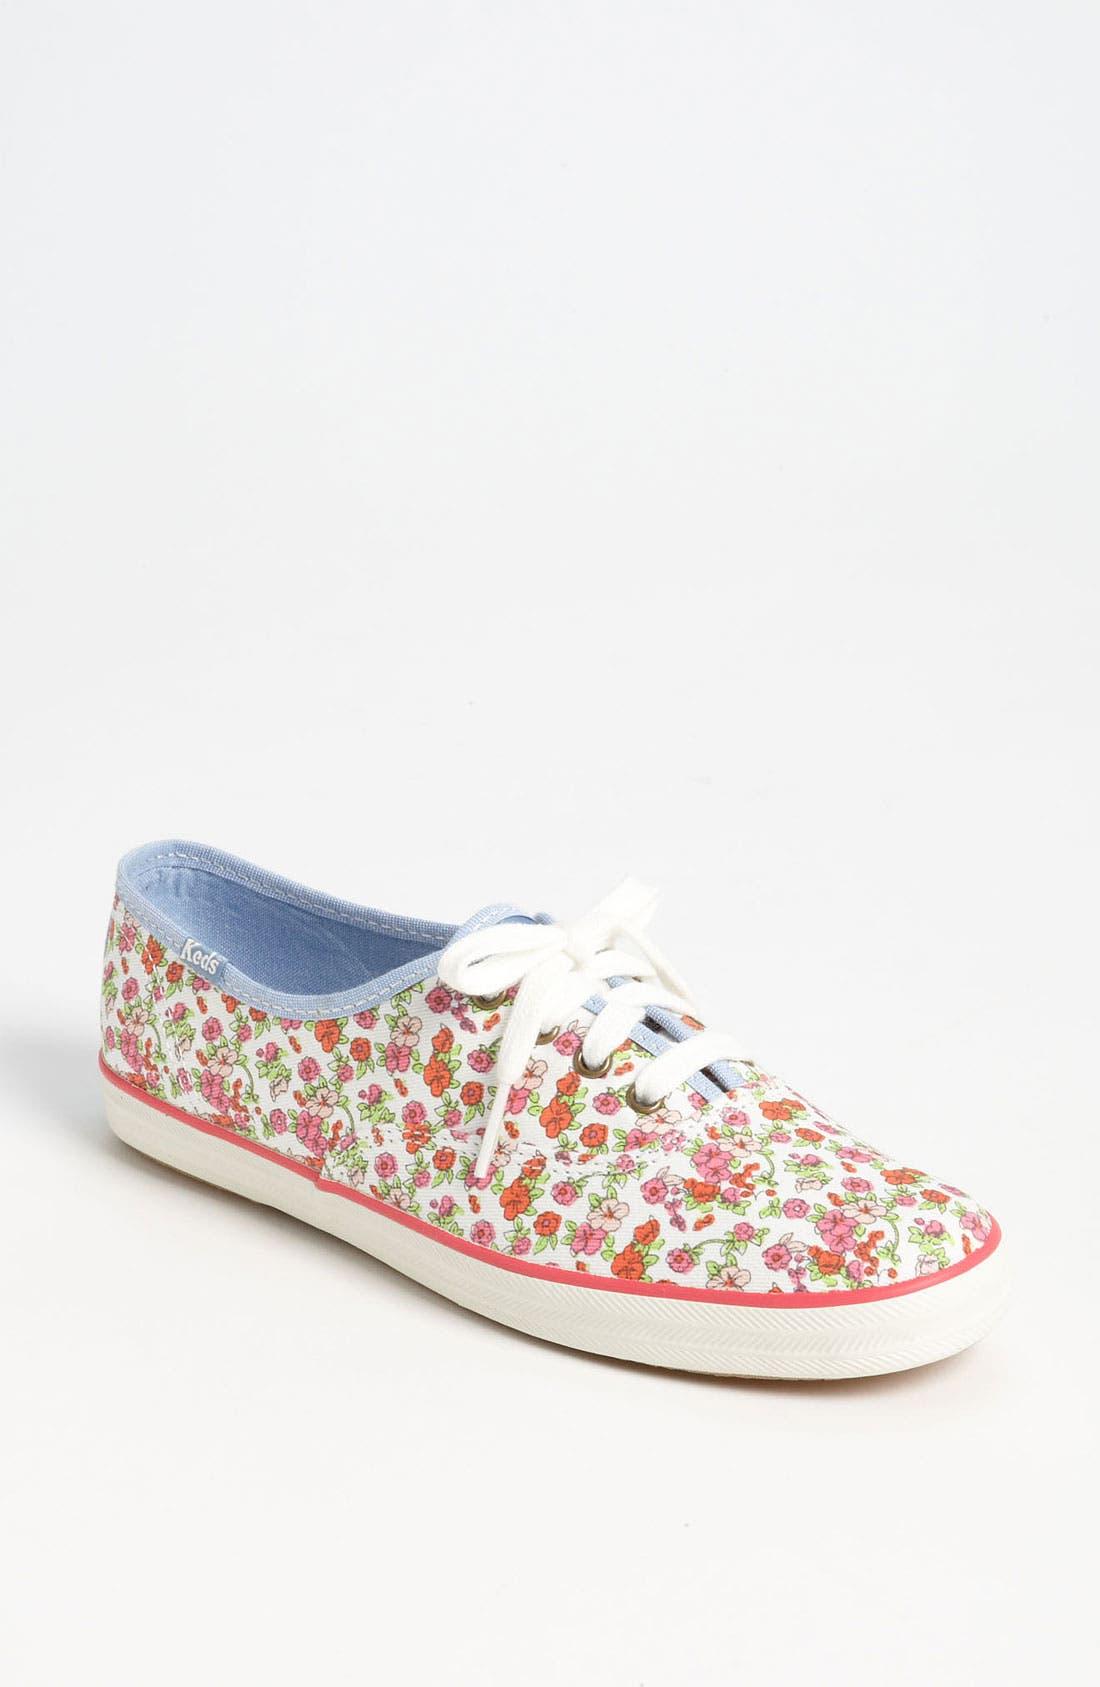 Alternate Image 1 Selected - Keds® 'Champion - Floral' Sneaker (Women)